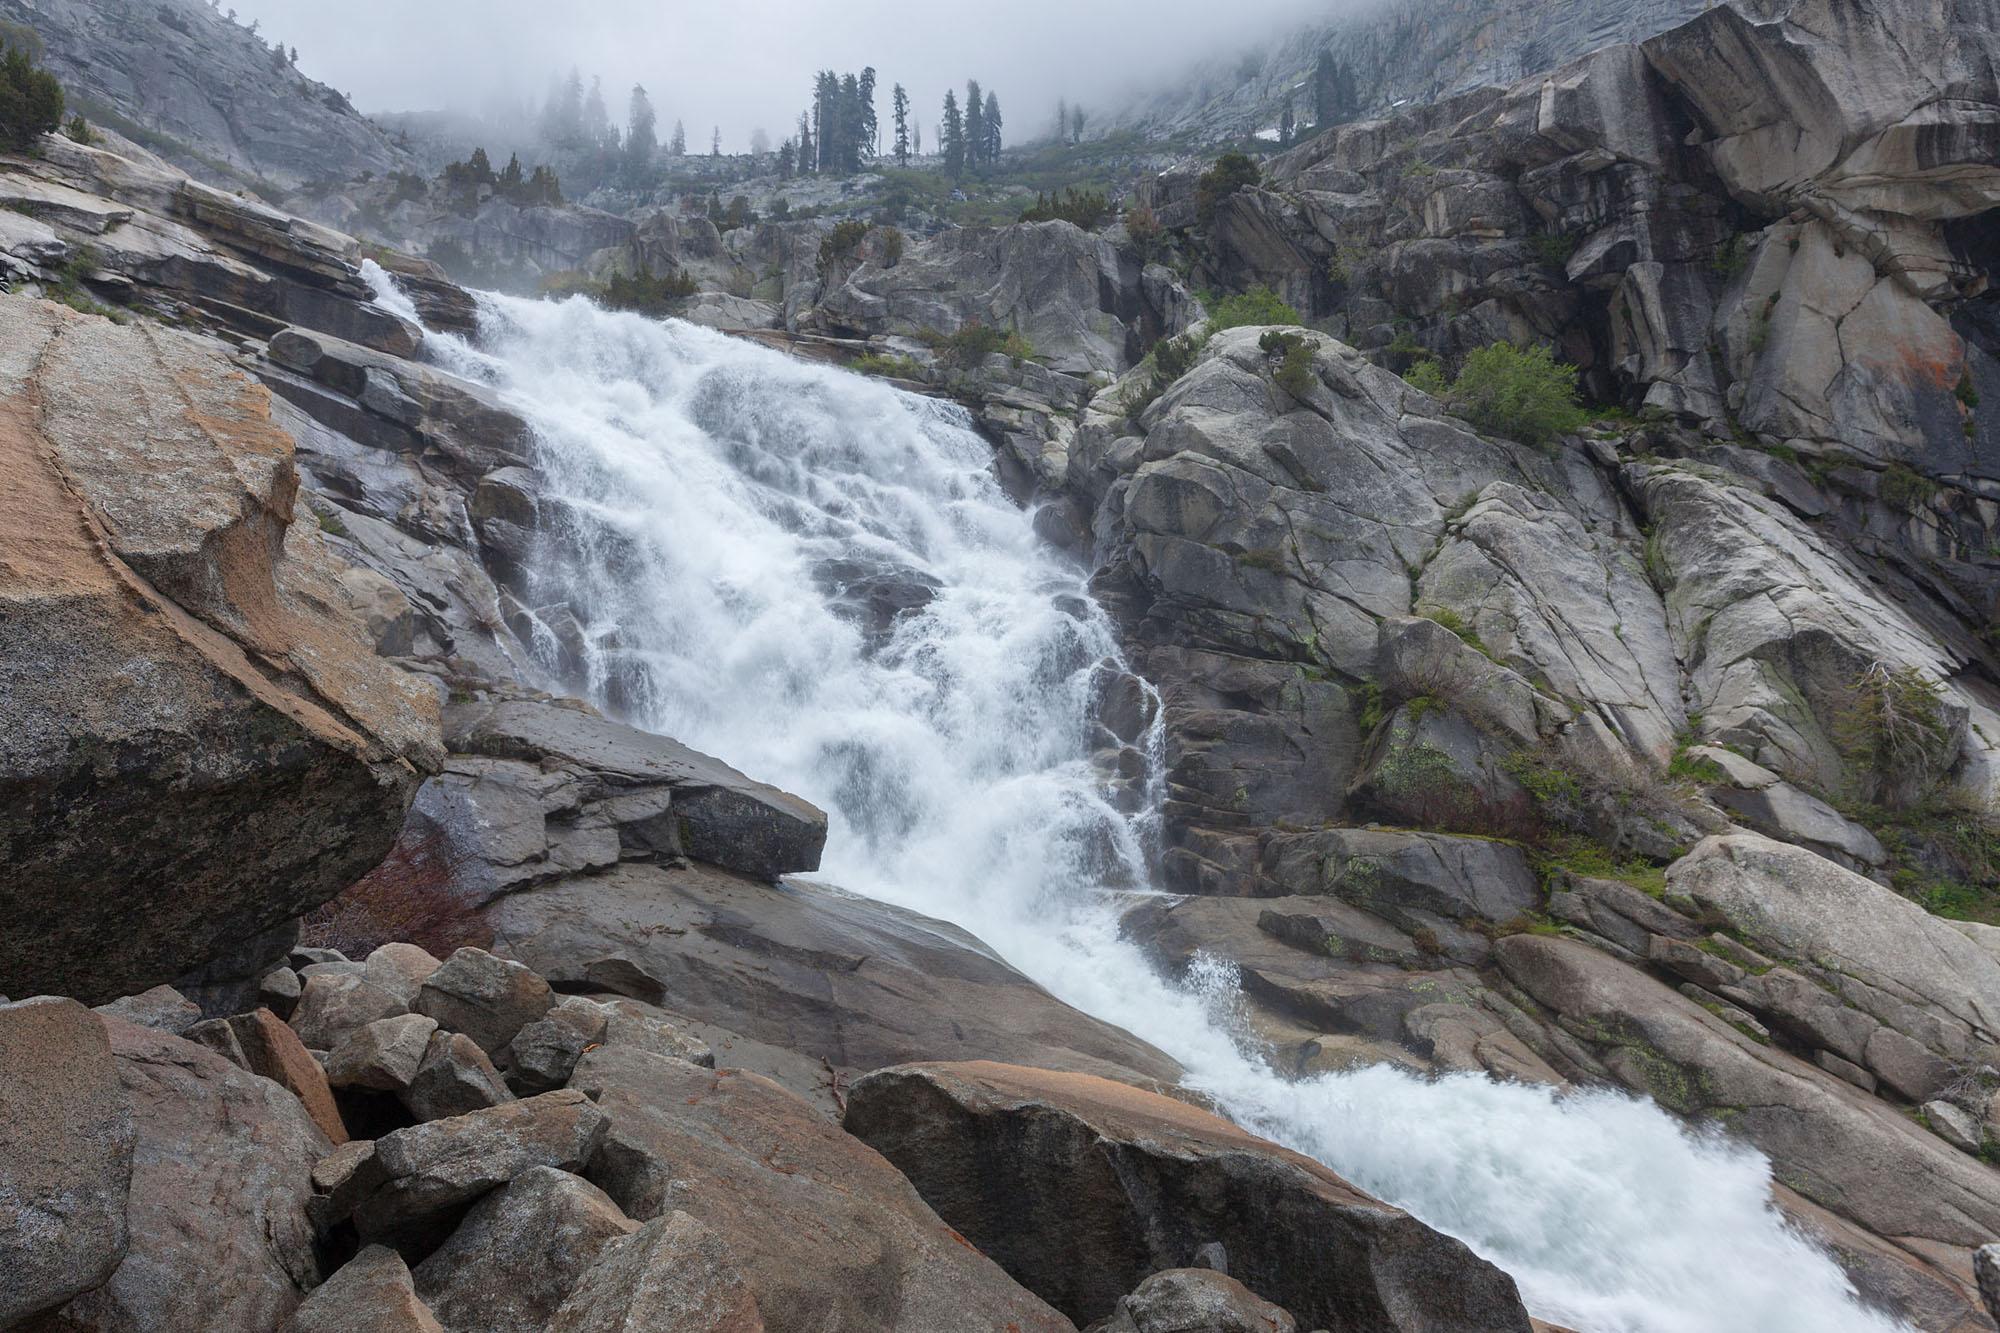 The Tokopah Valley Trail 2017